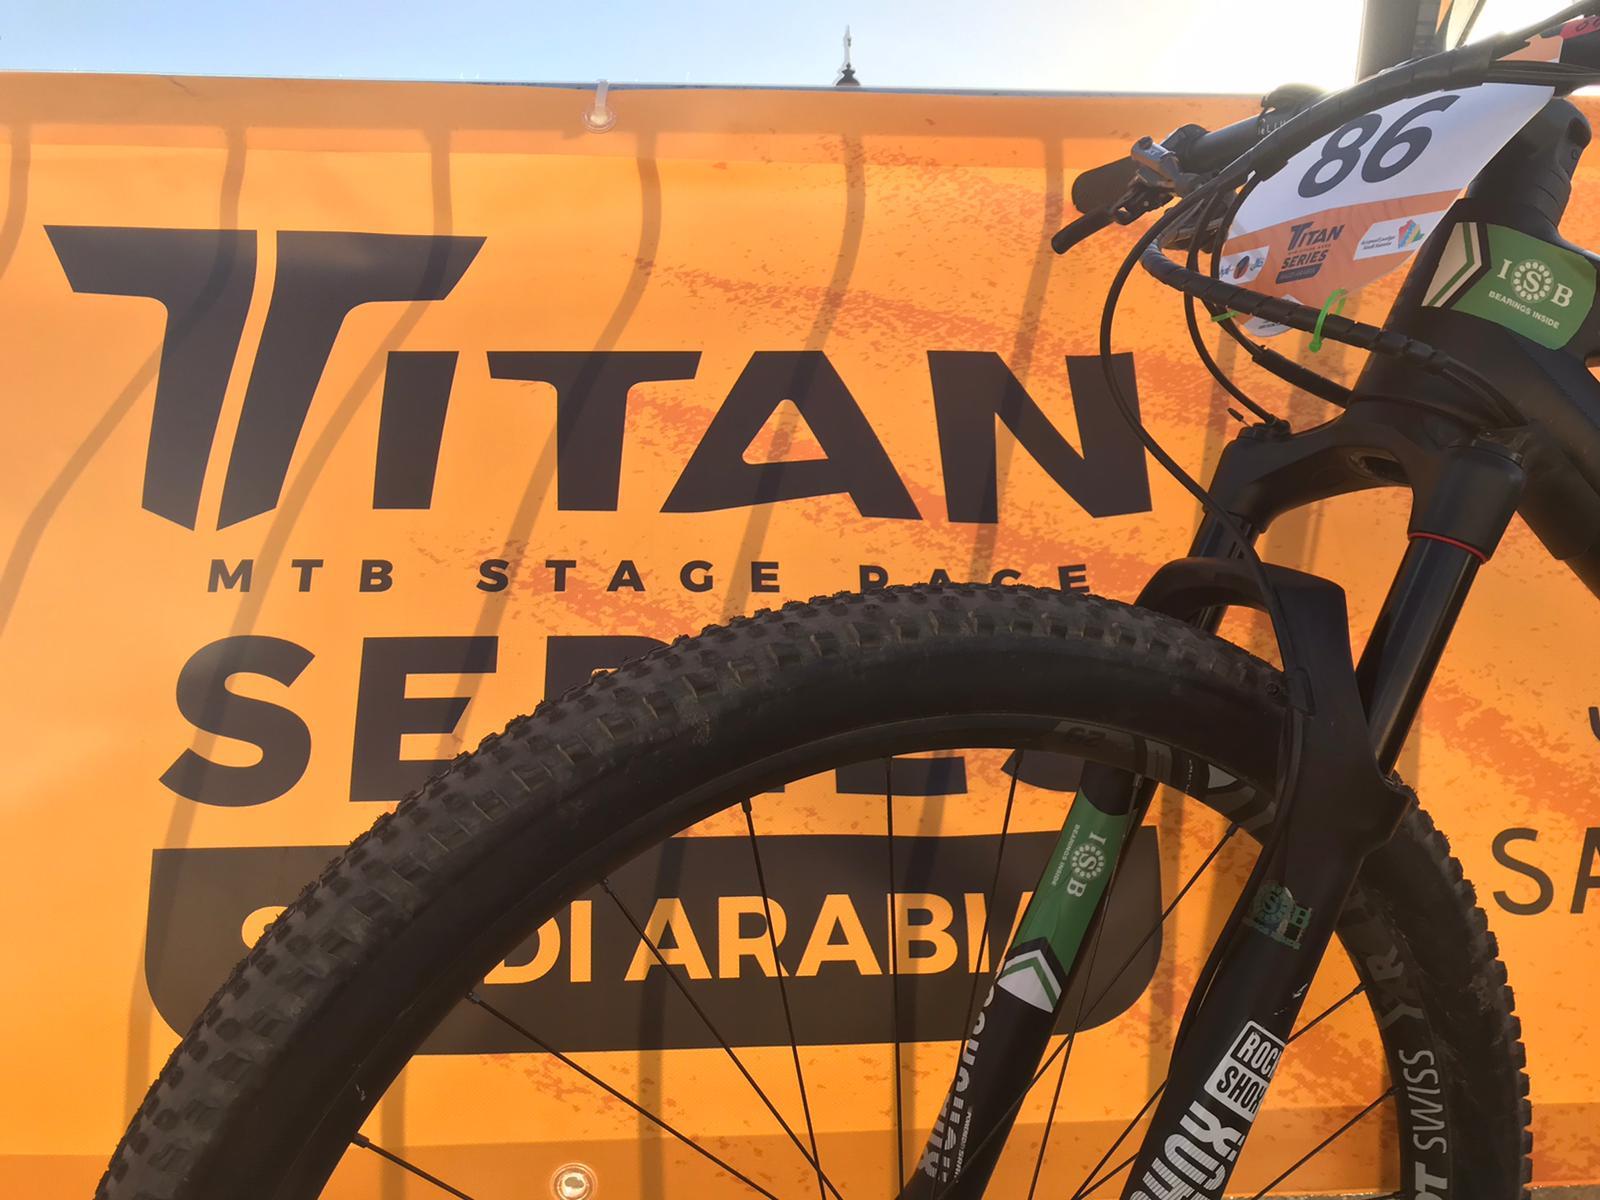 ISB Sport - Fat Bike Barcelona Titan Series Arabia (40)